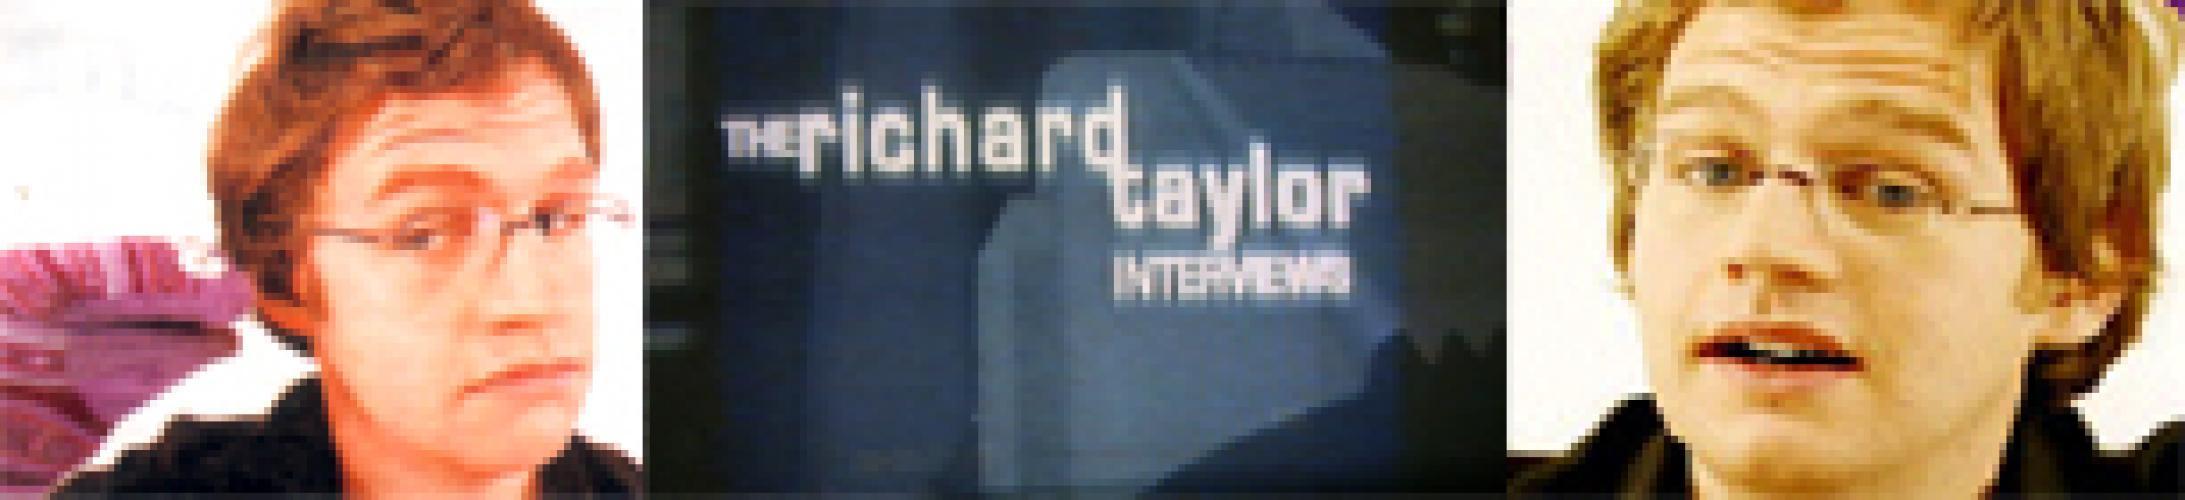 The Richard Taylor Interviews next episode air date poster